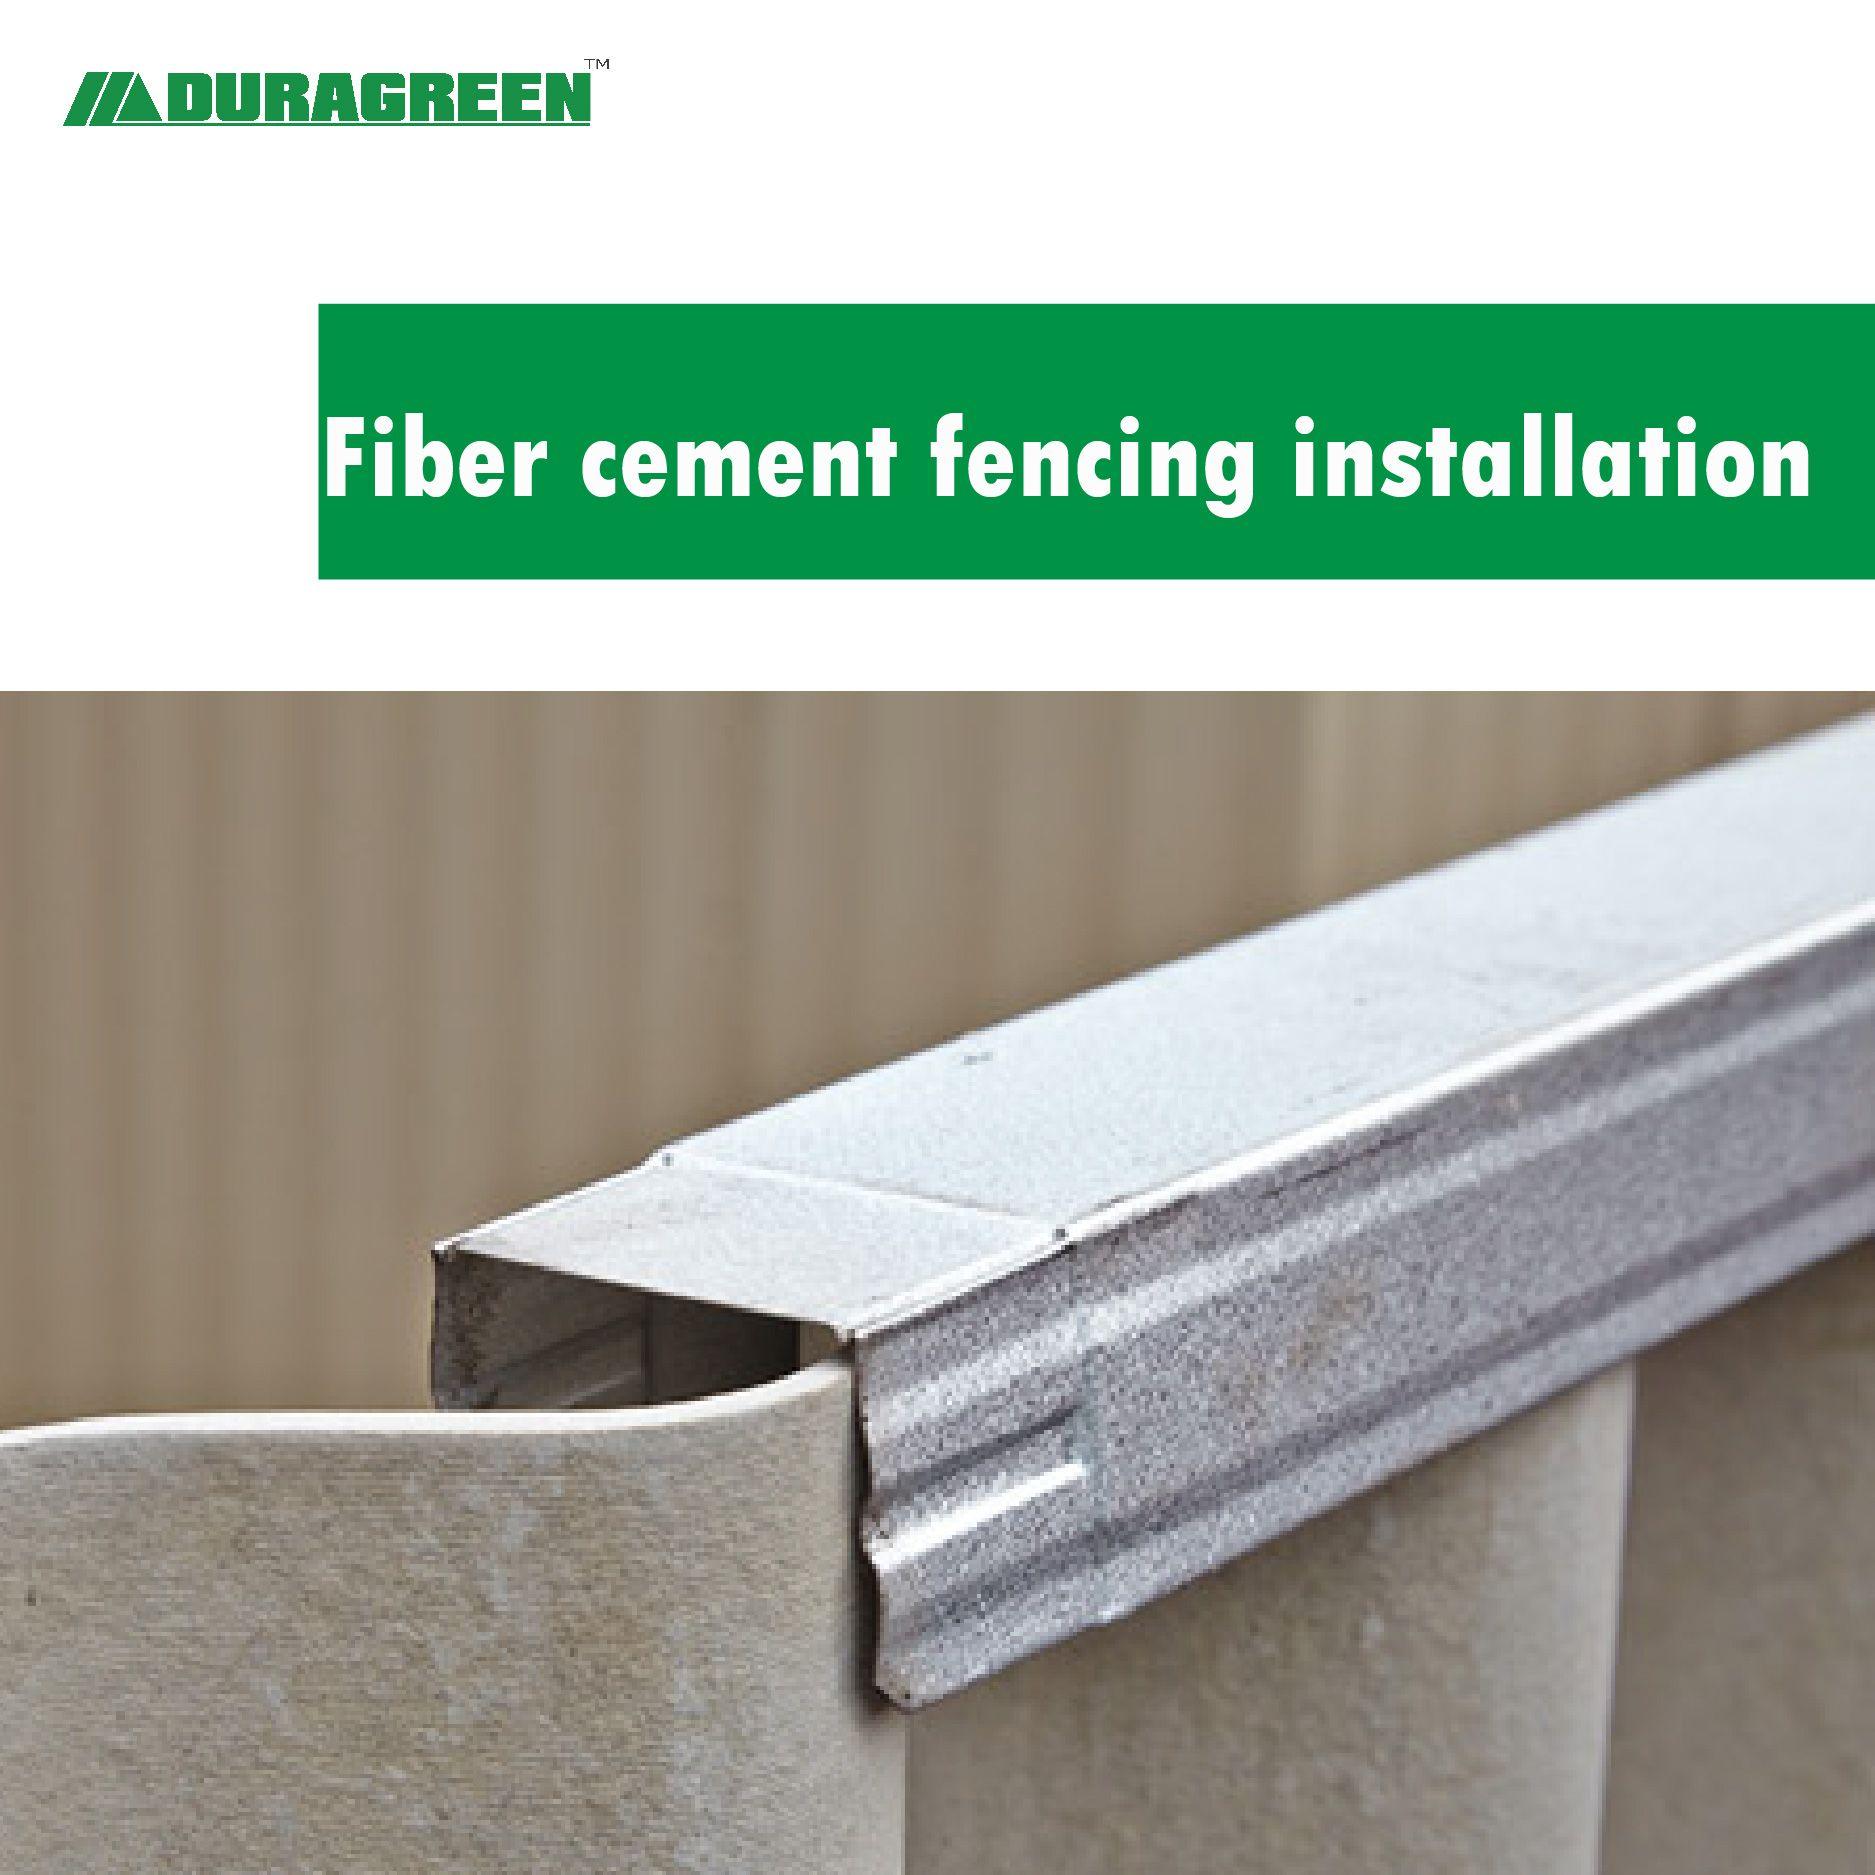 Fiber Cement Fencing Installation In 2020 Fiber Cement Installation Corrugated Roofing